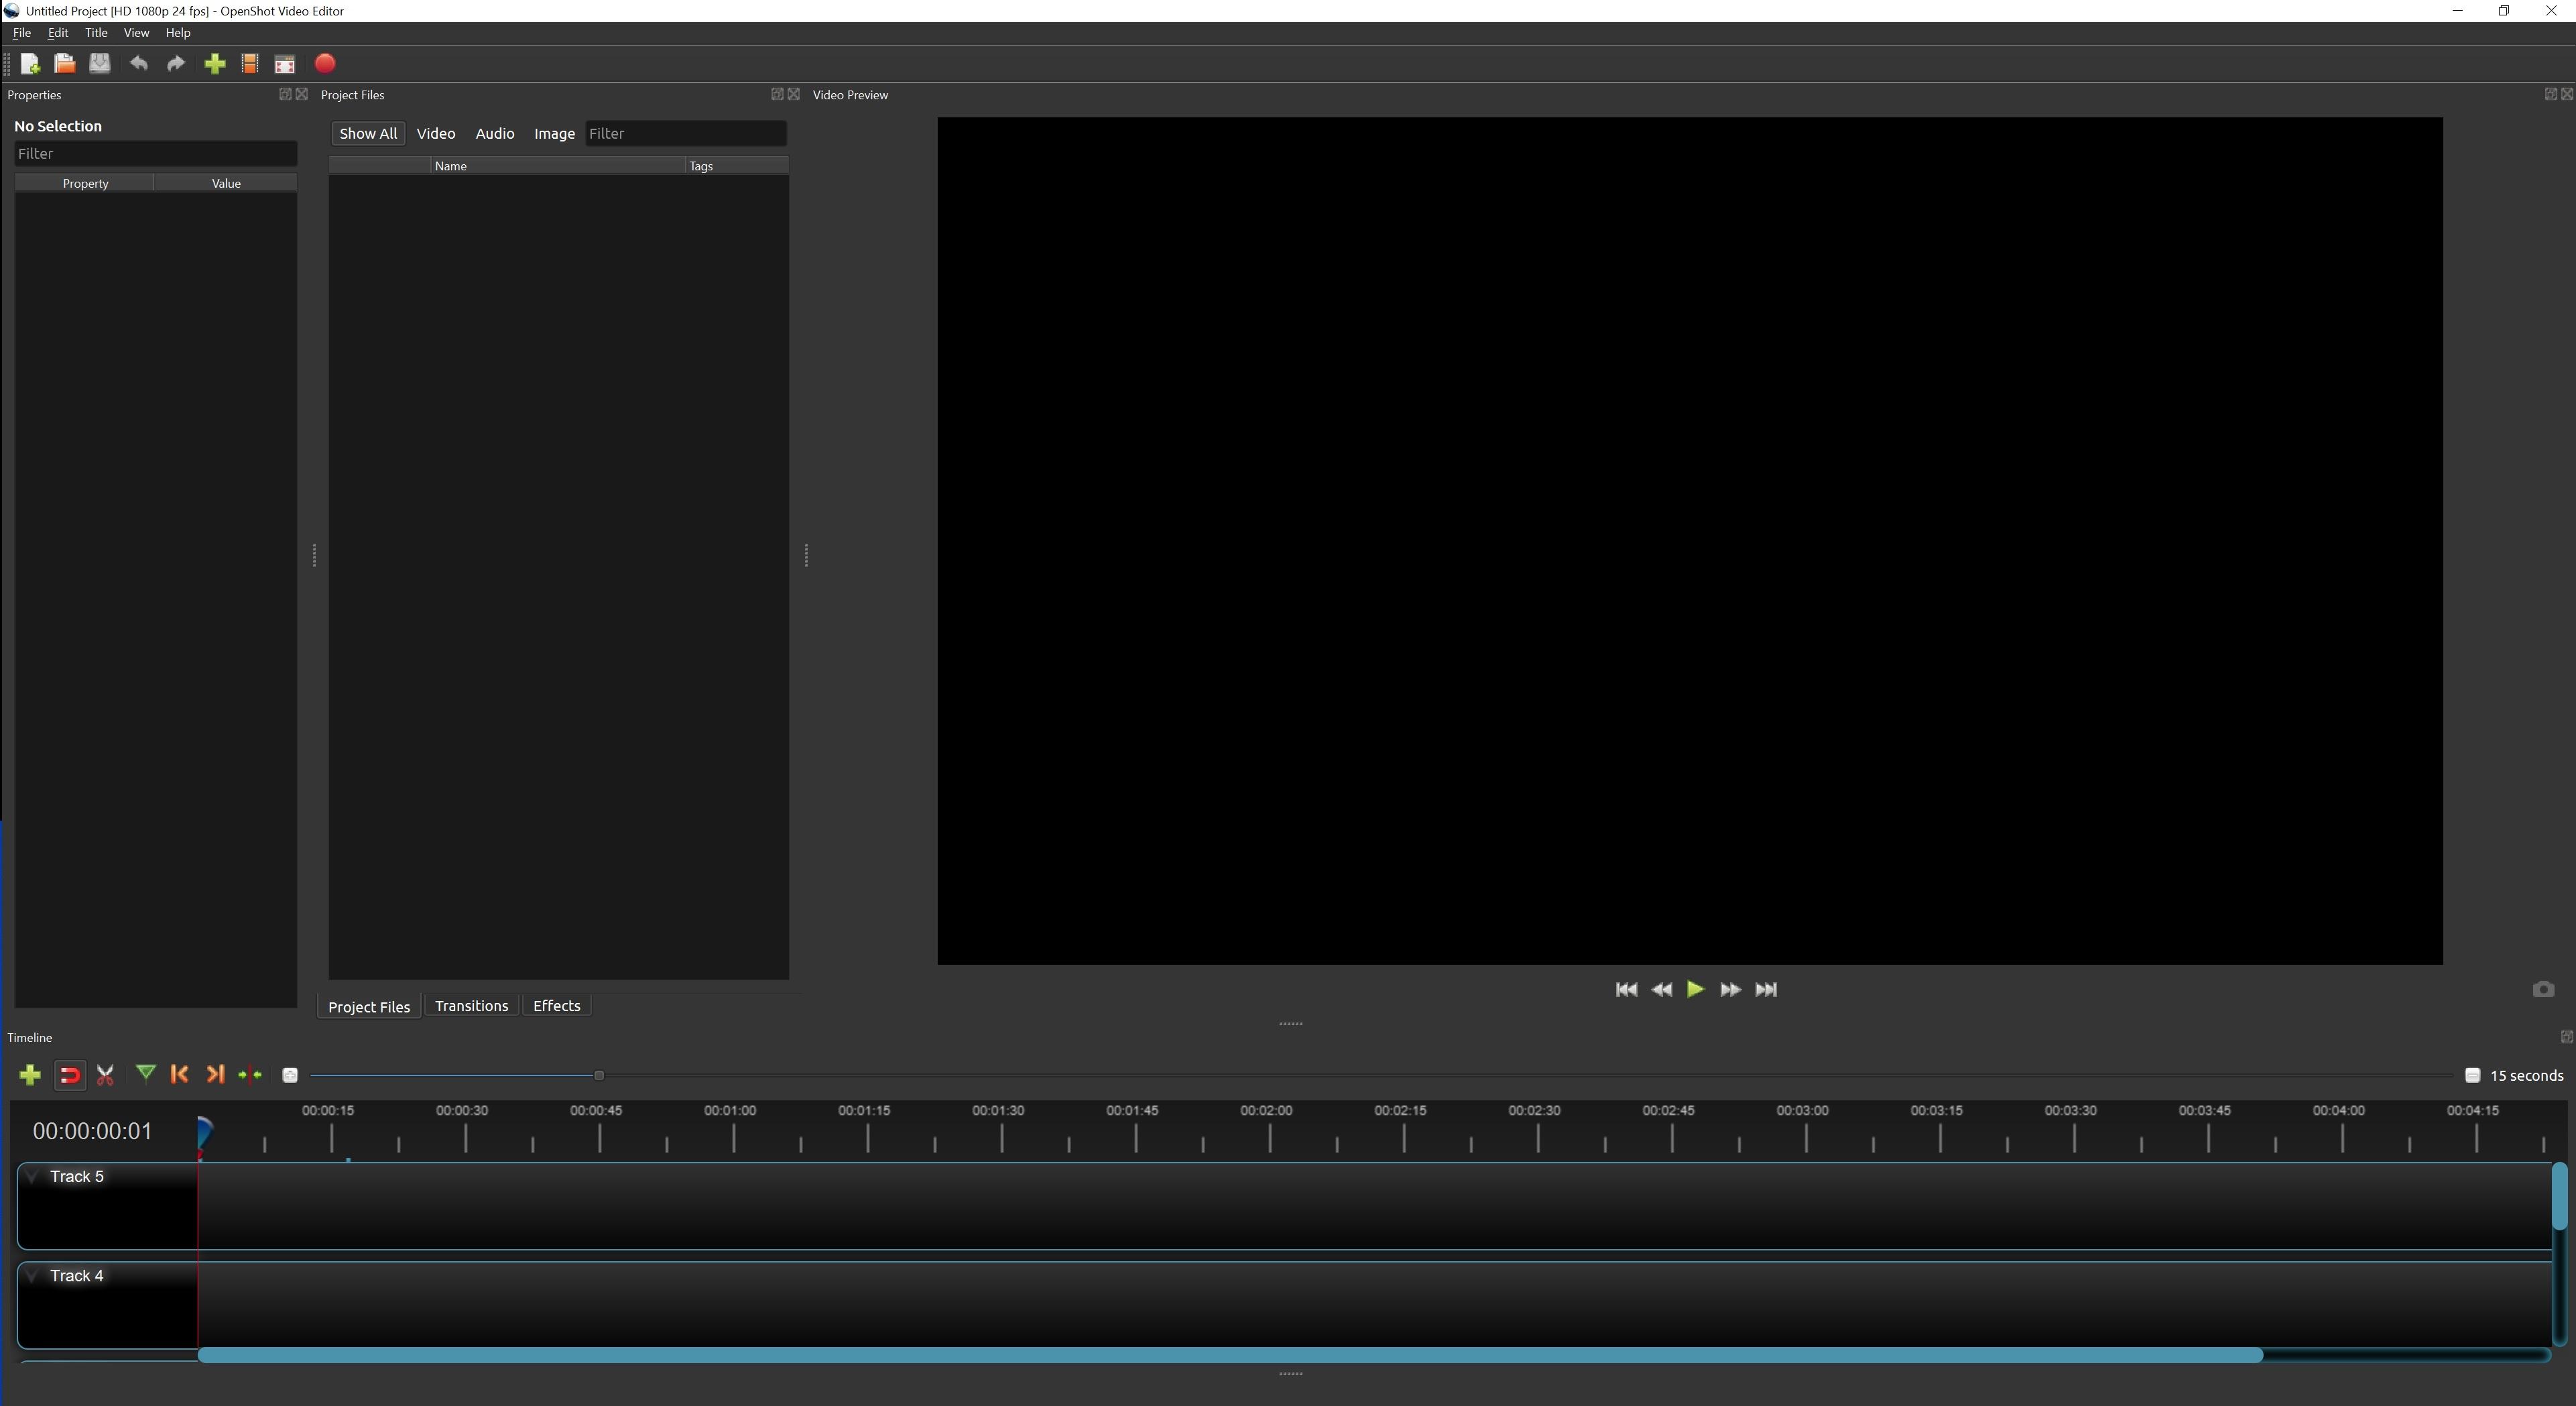 OpenShot UI